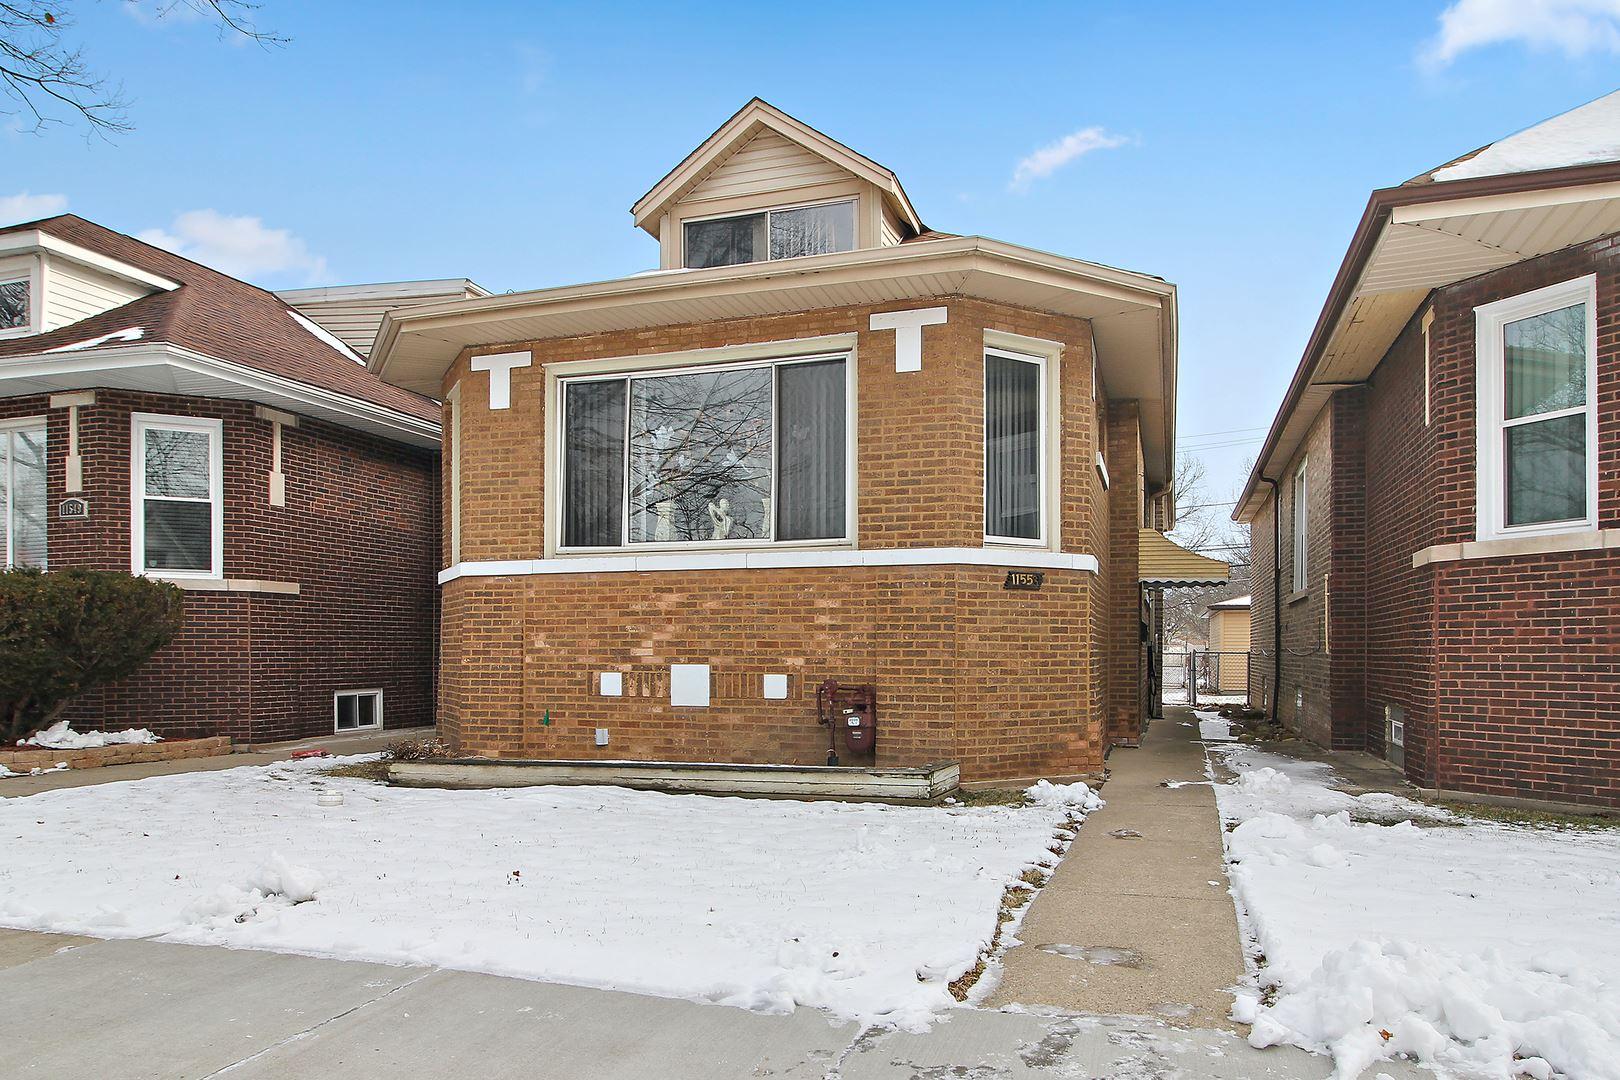 11553 S Hale Avenue, Chicago, IL 60643 - #: 10621922